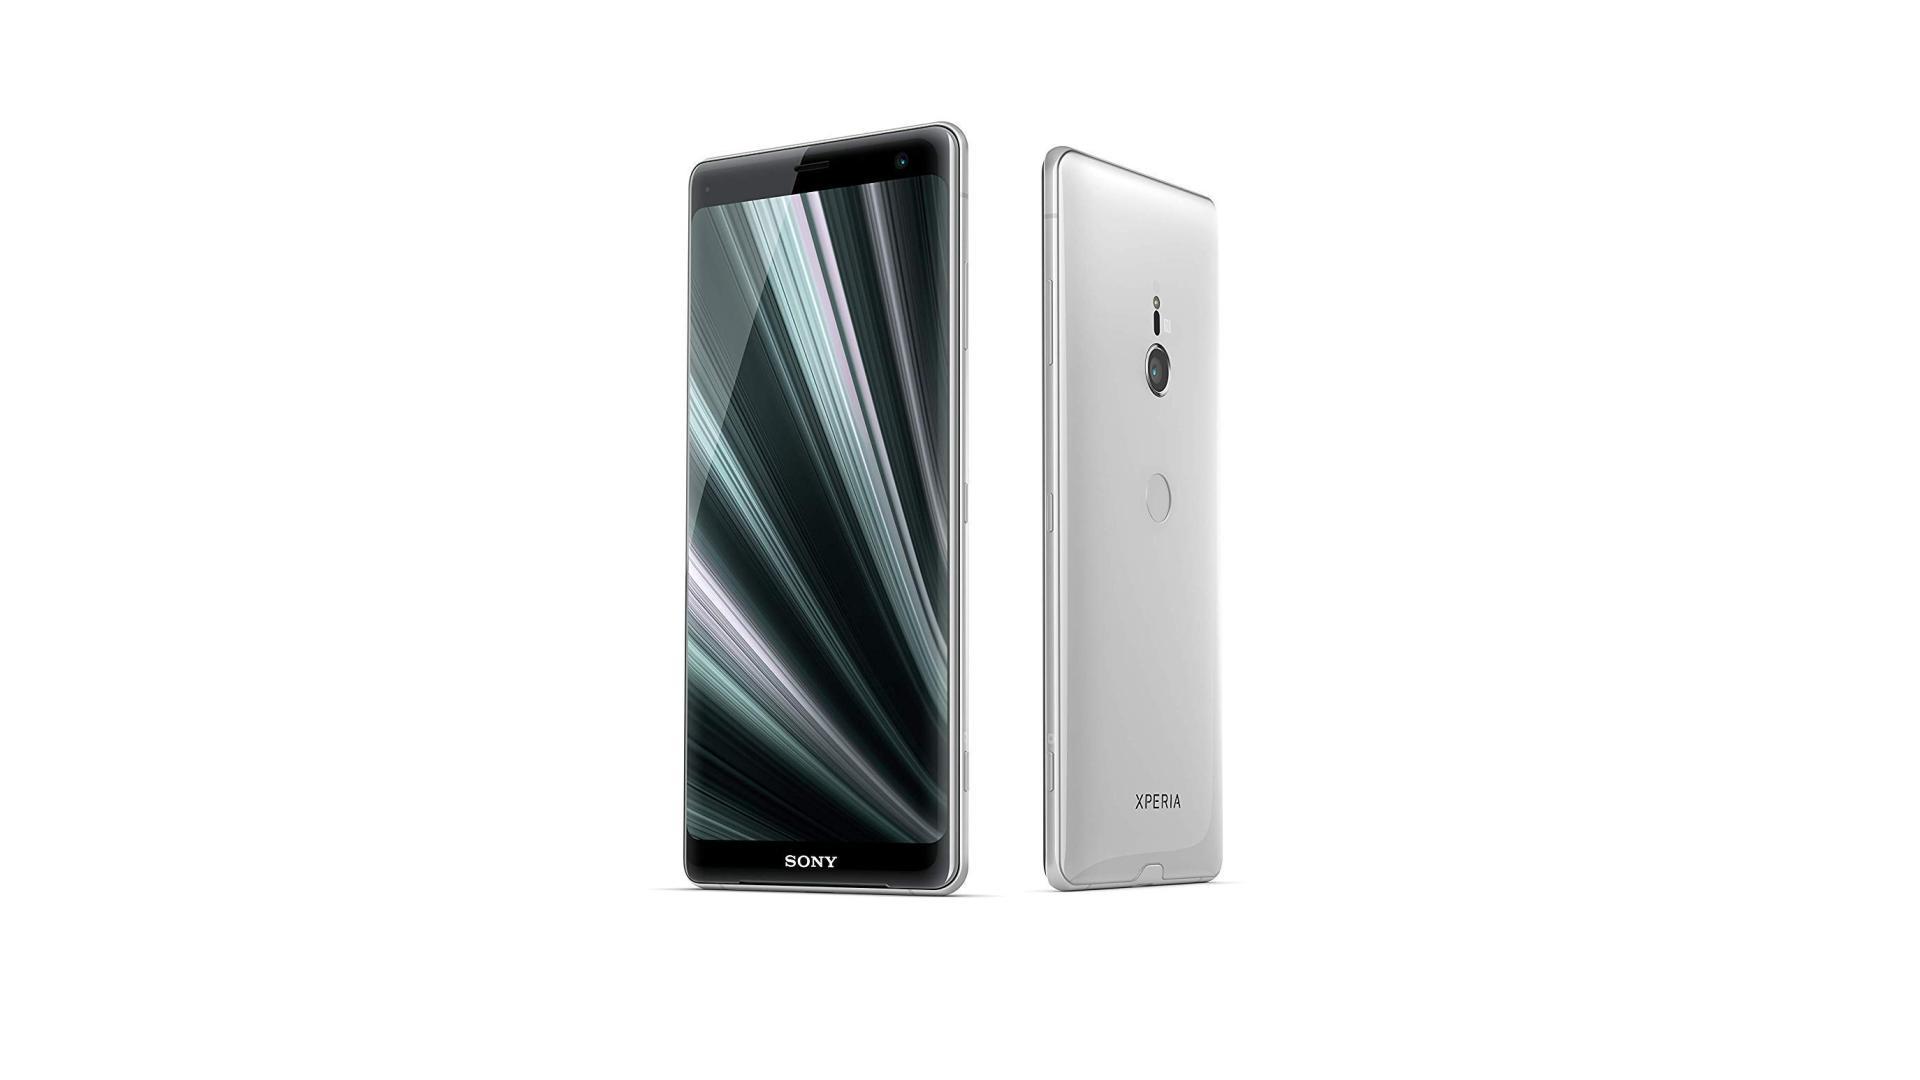 🔥 Cyber Monday : le smartphone Sony Xperia XZ3 à 599 euros chez Amazon